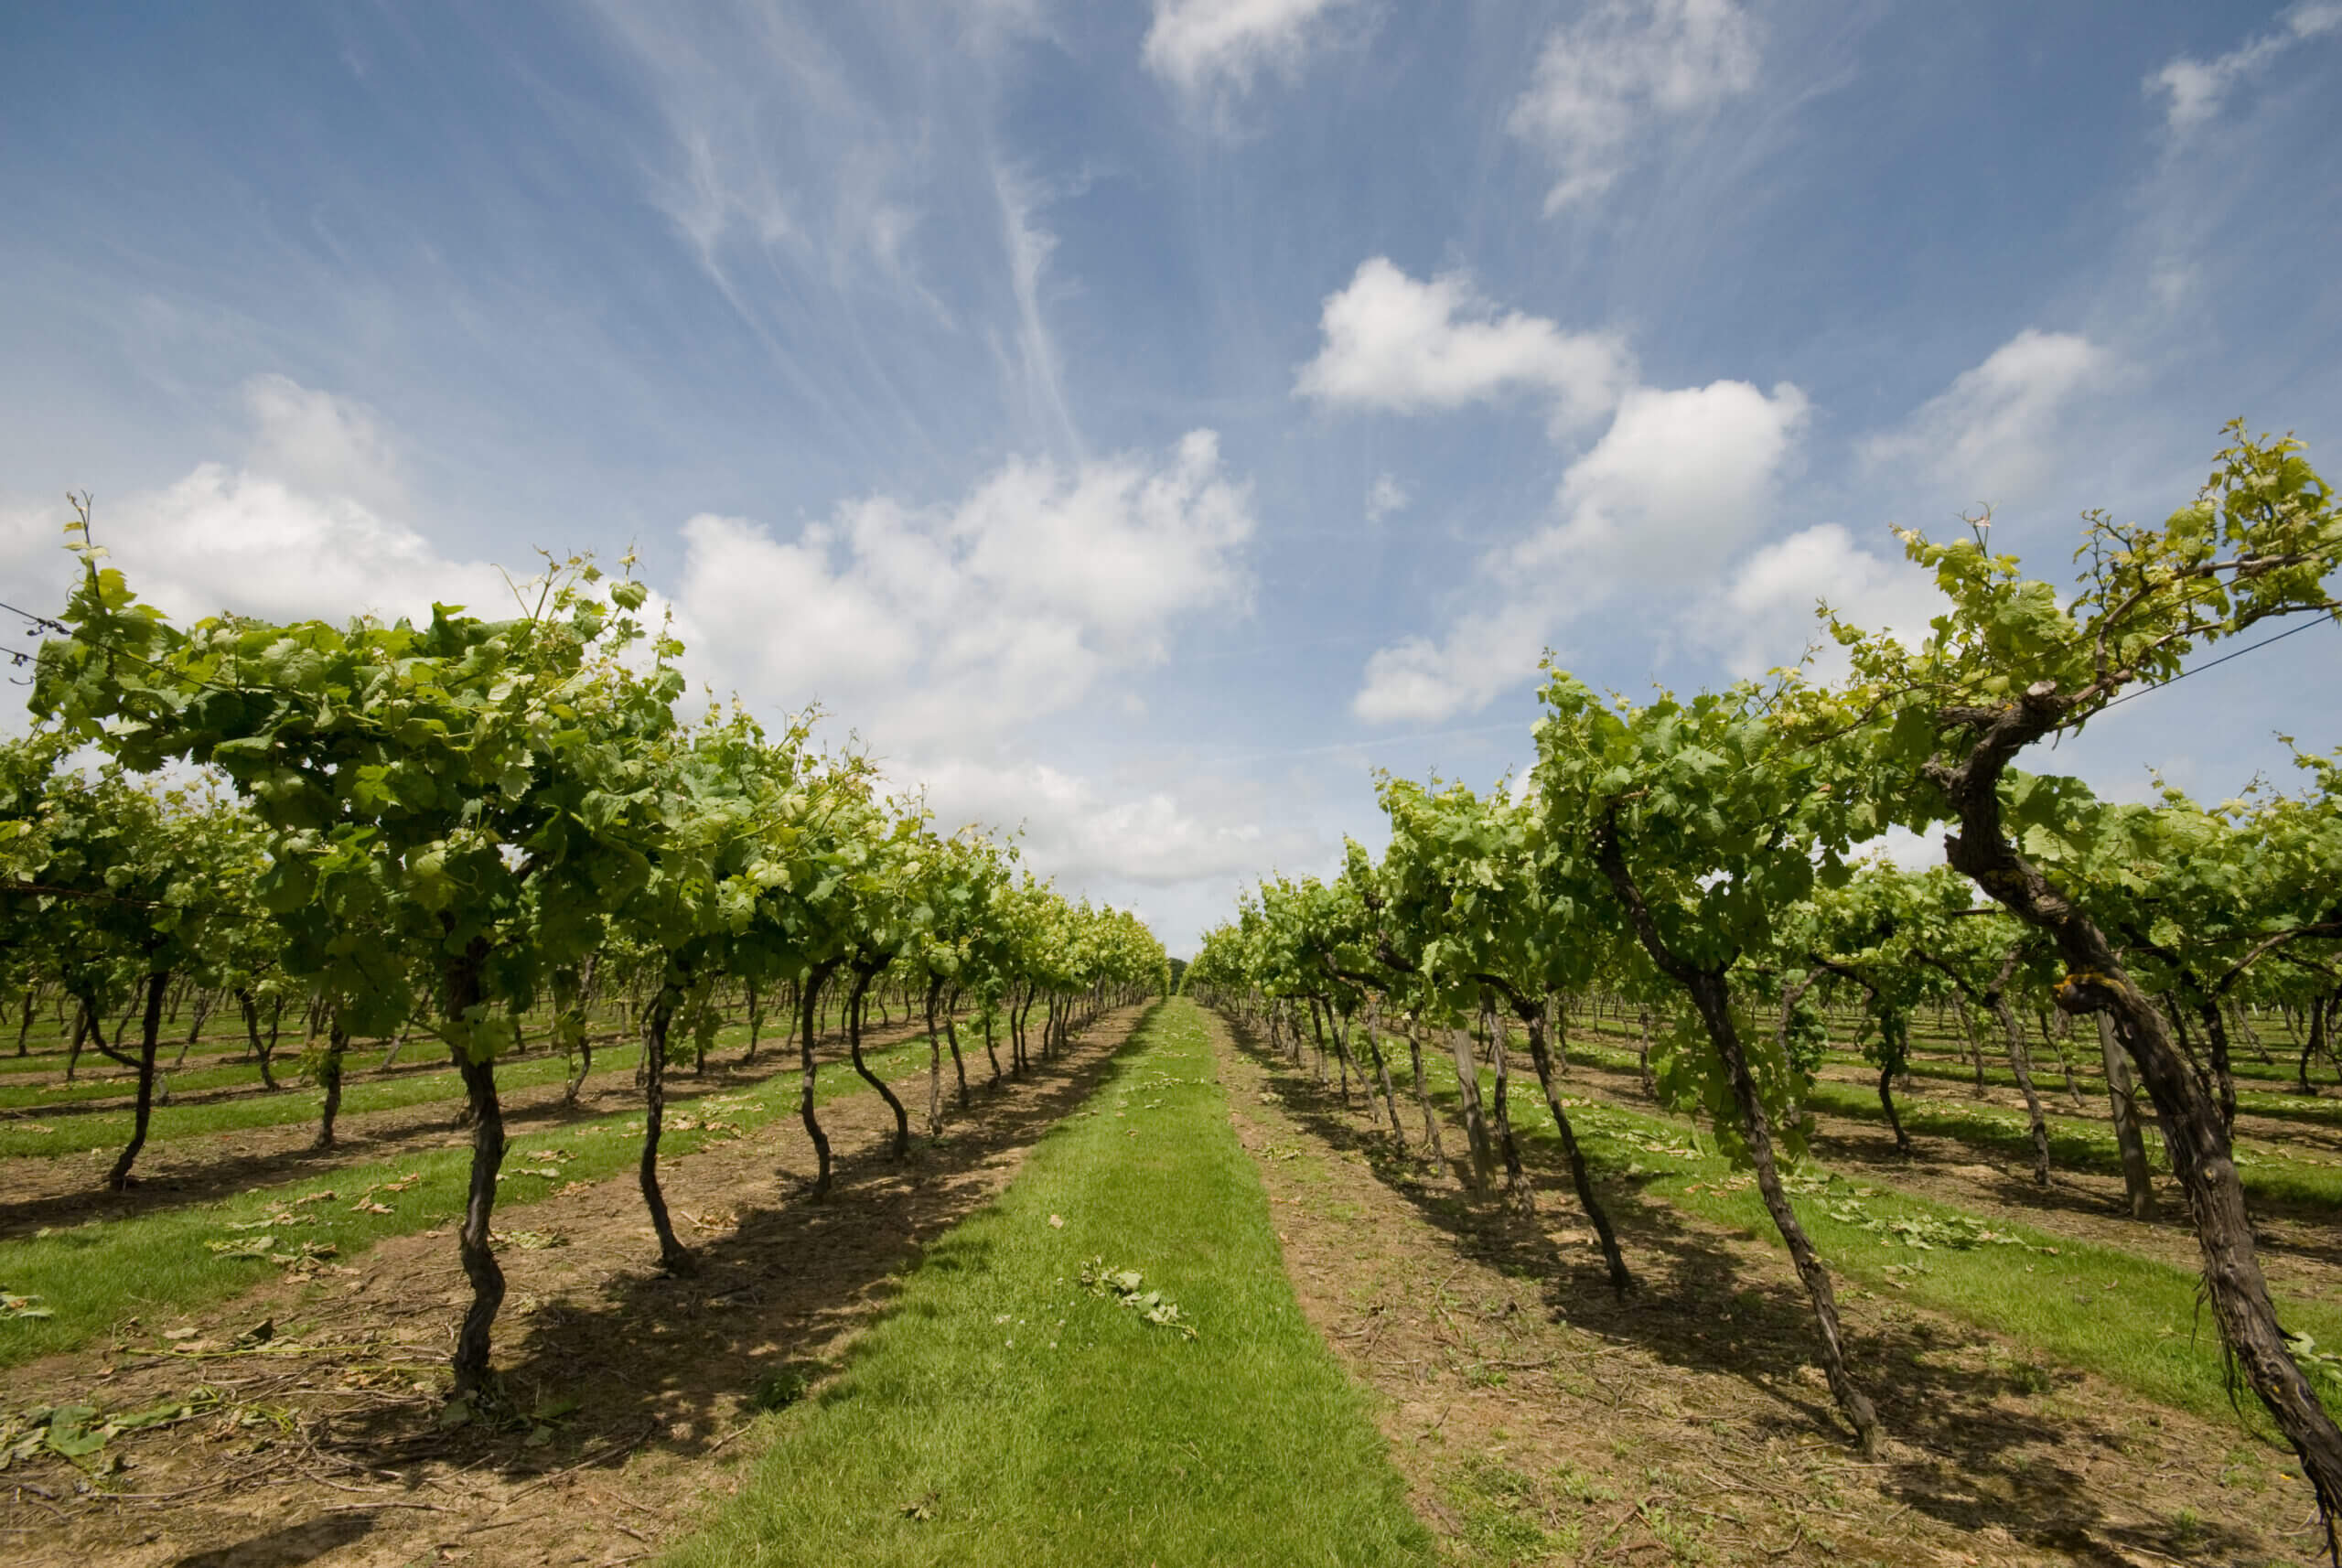 The vines at Biddenden